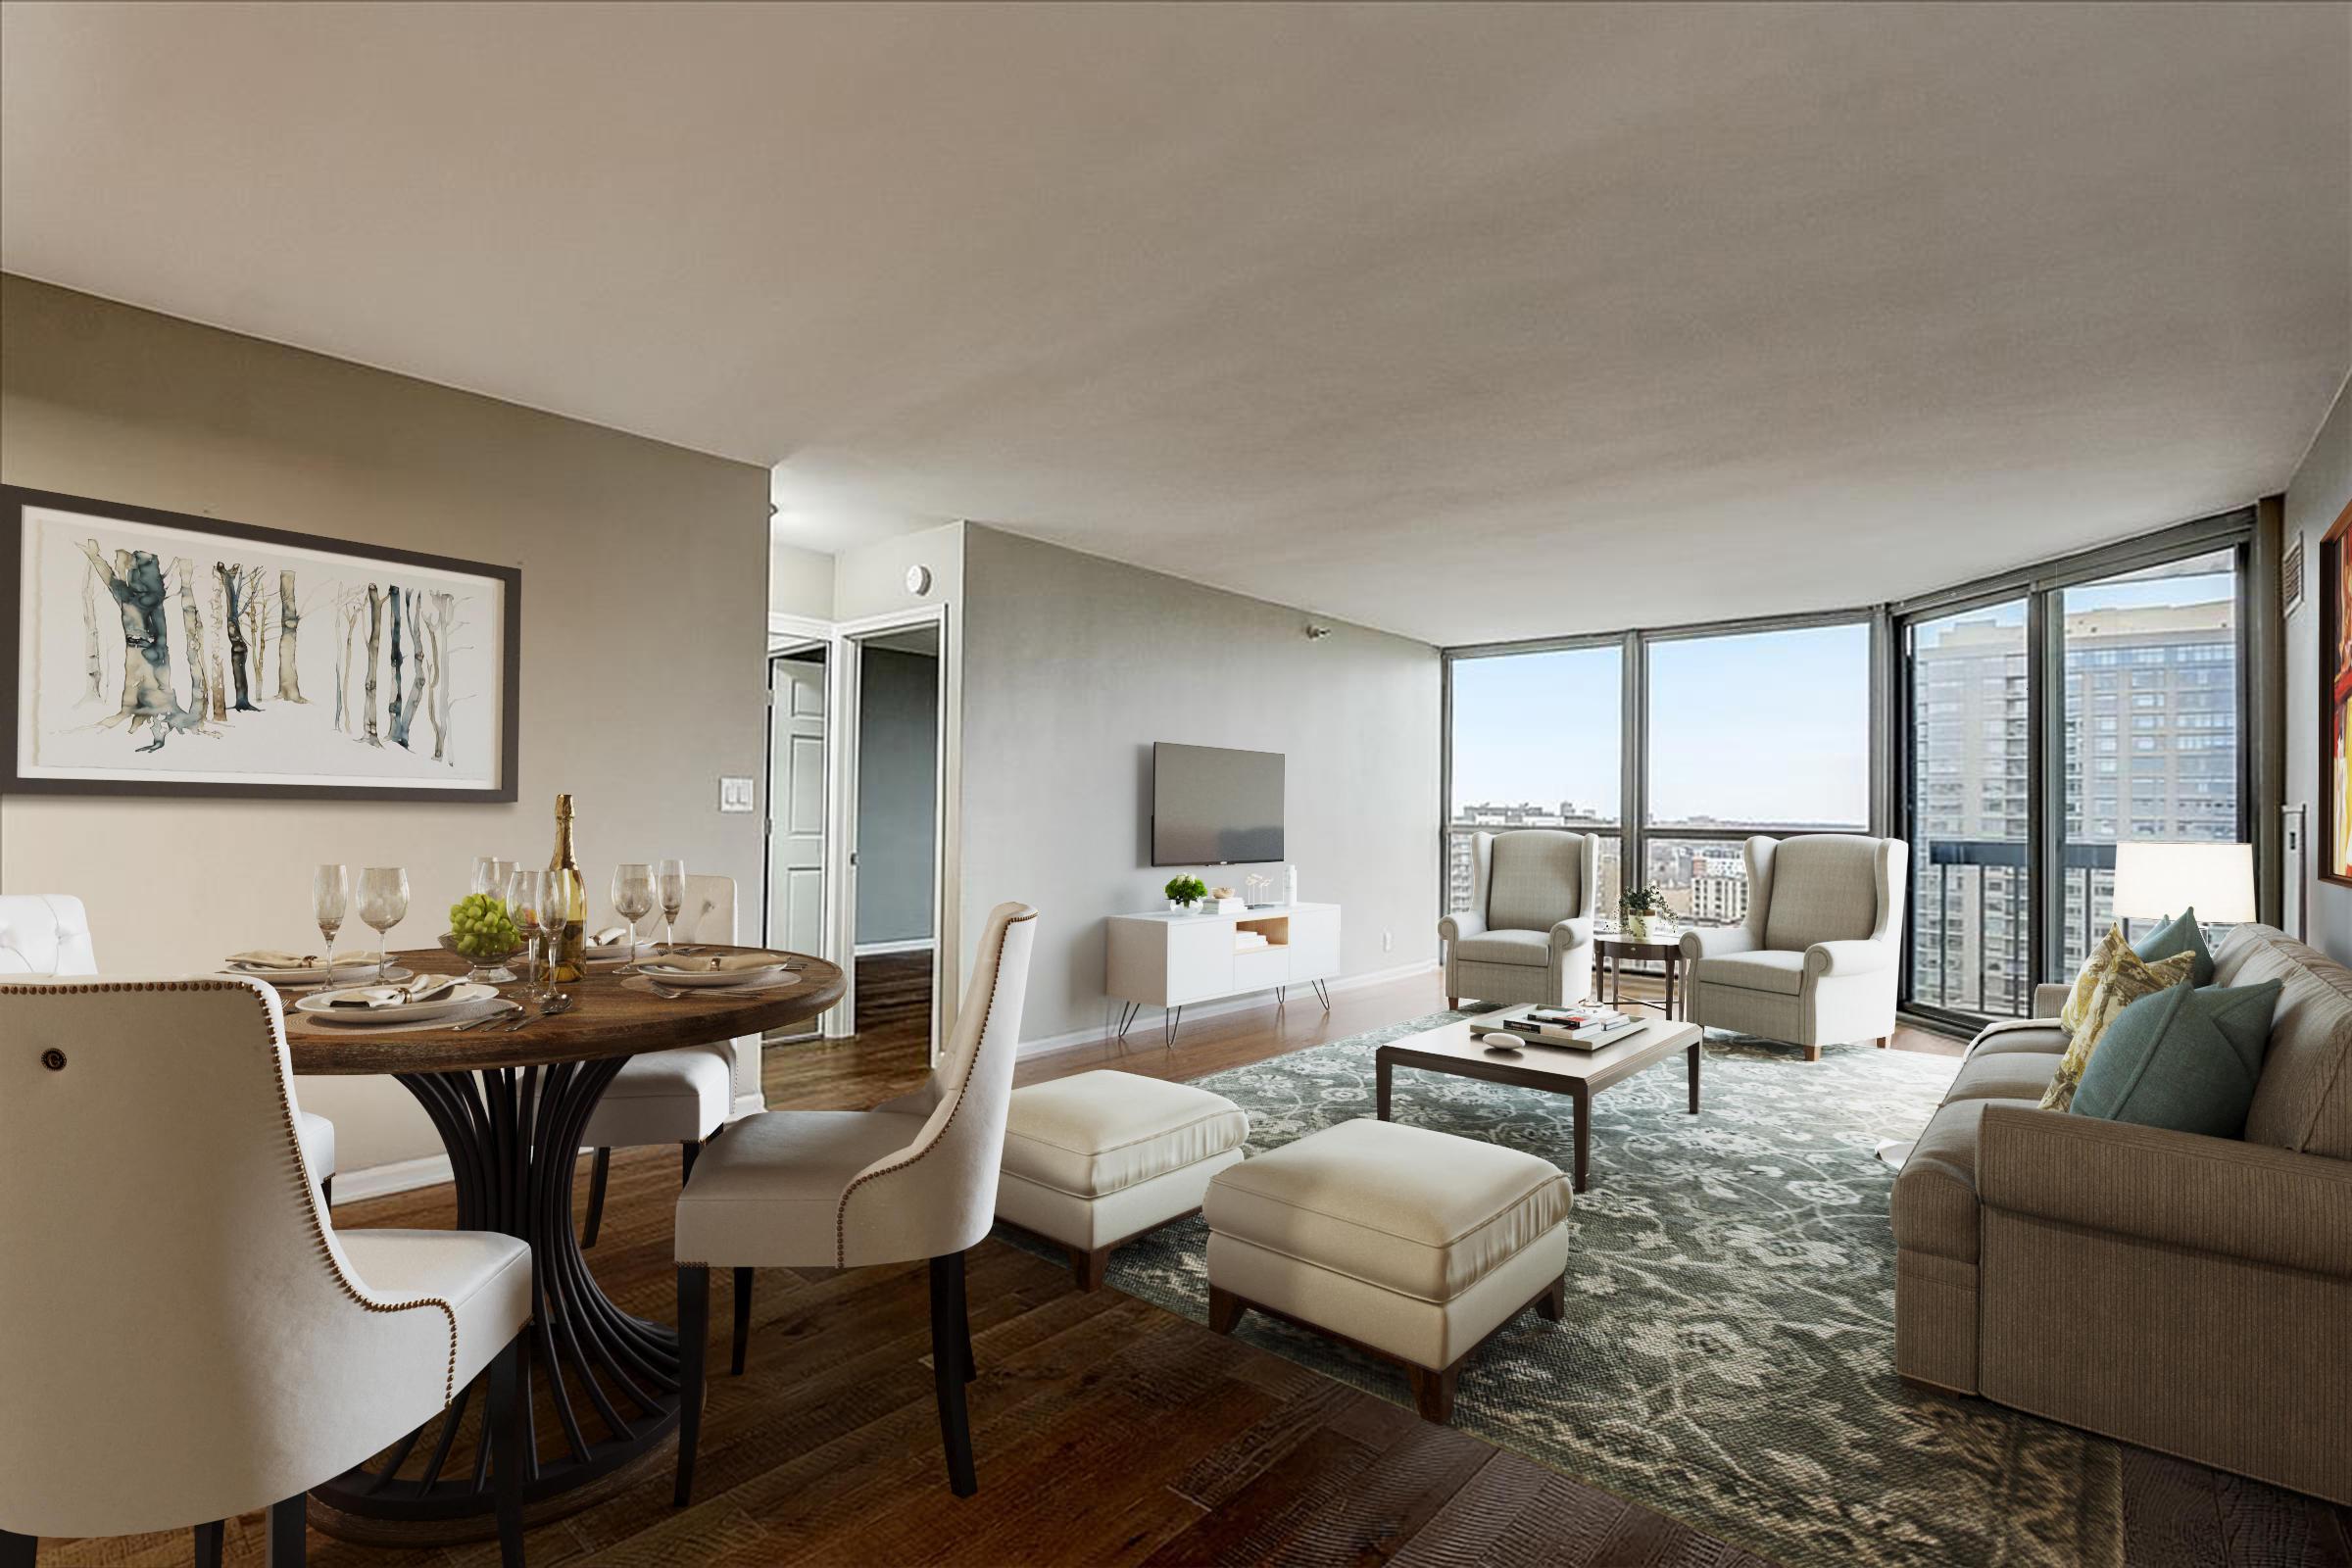 1660 Prospect Ave, Milwaukee, Wisconsin 53202, 2 Bedrooms Bedrooms, ,2 BathroomsBathrooms,Condominium,For Sale,Prospect Ave,1720423